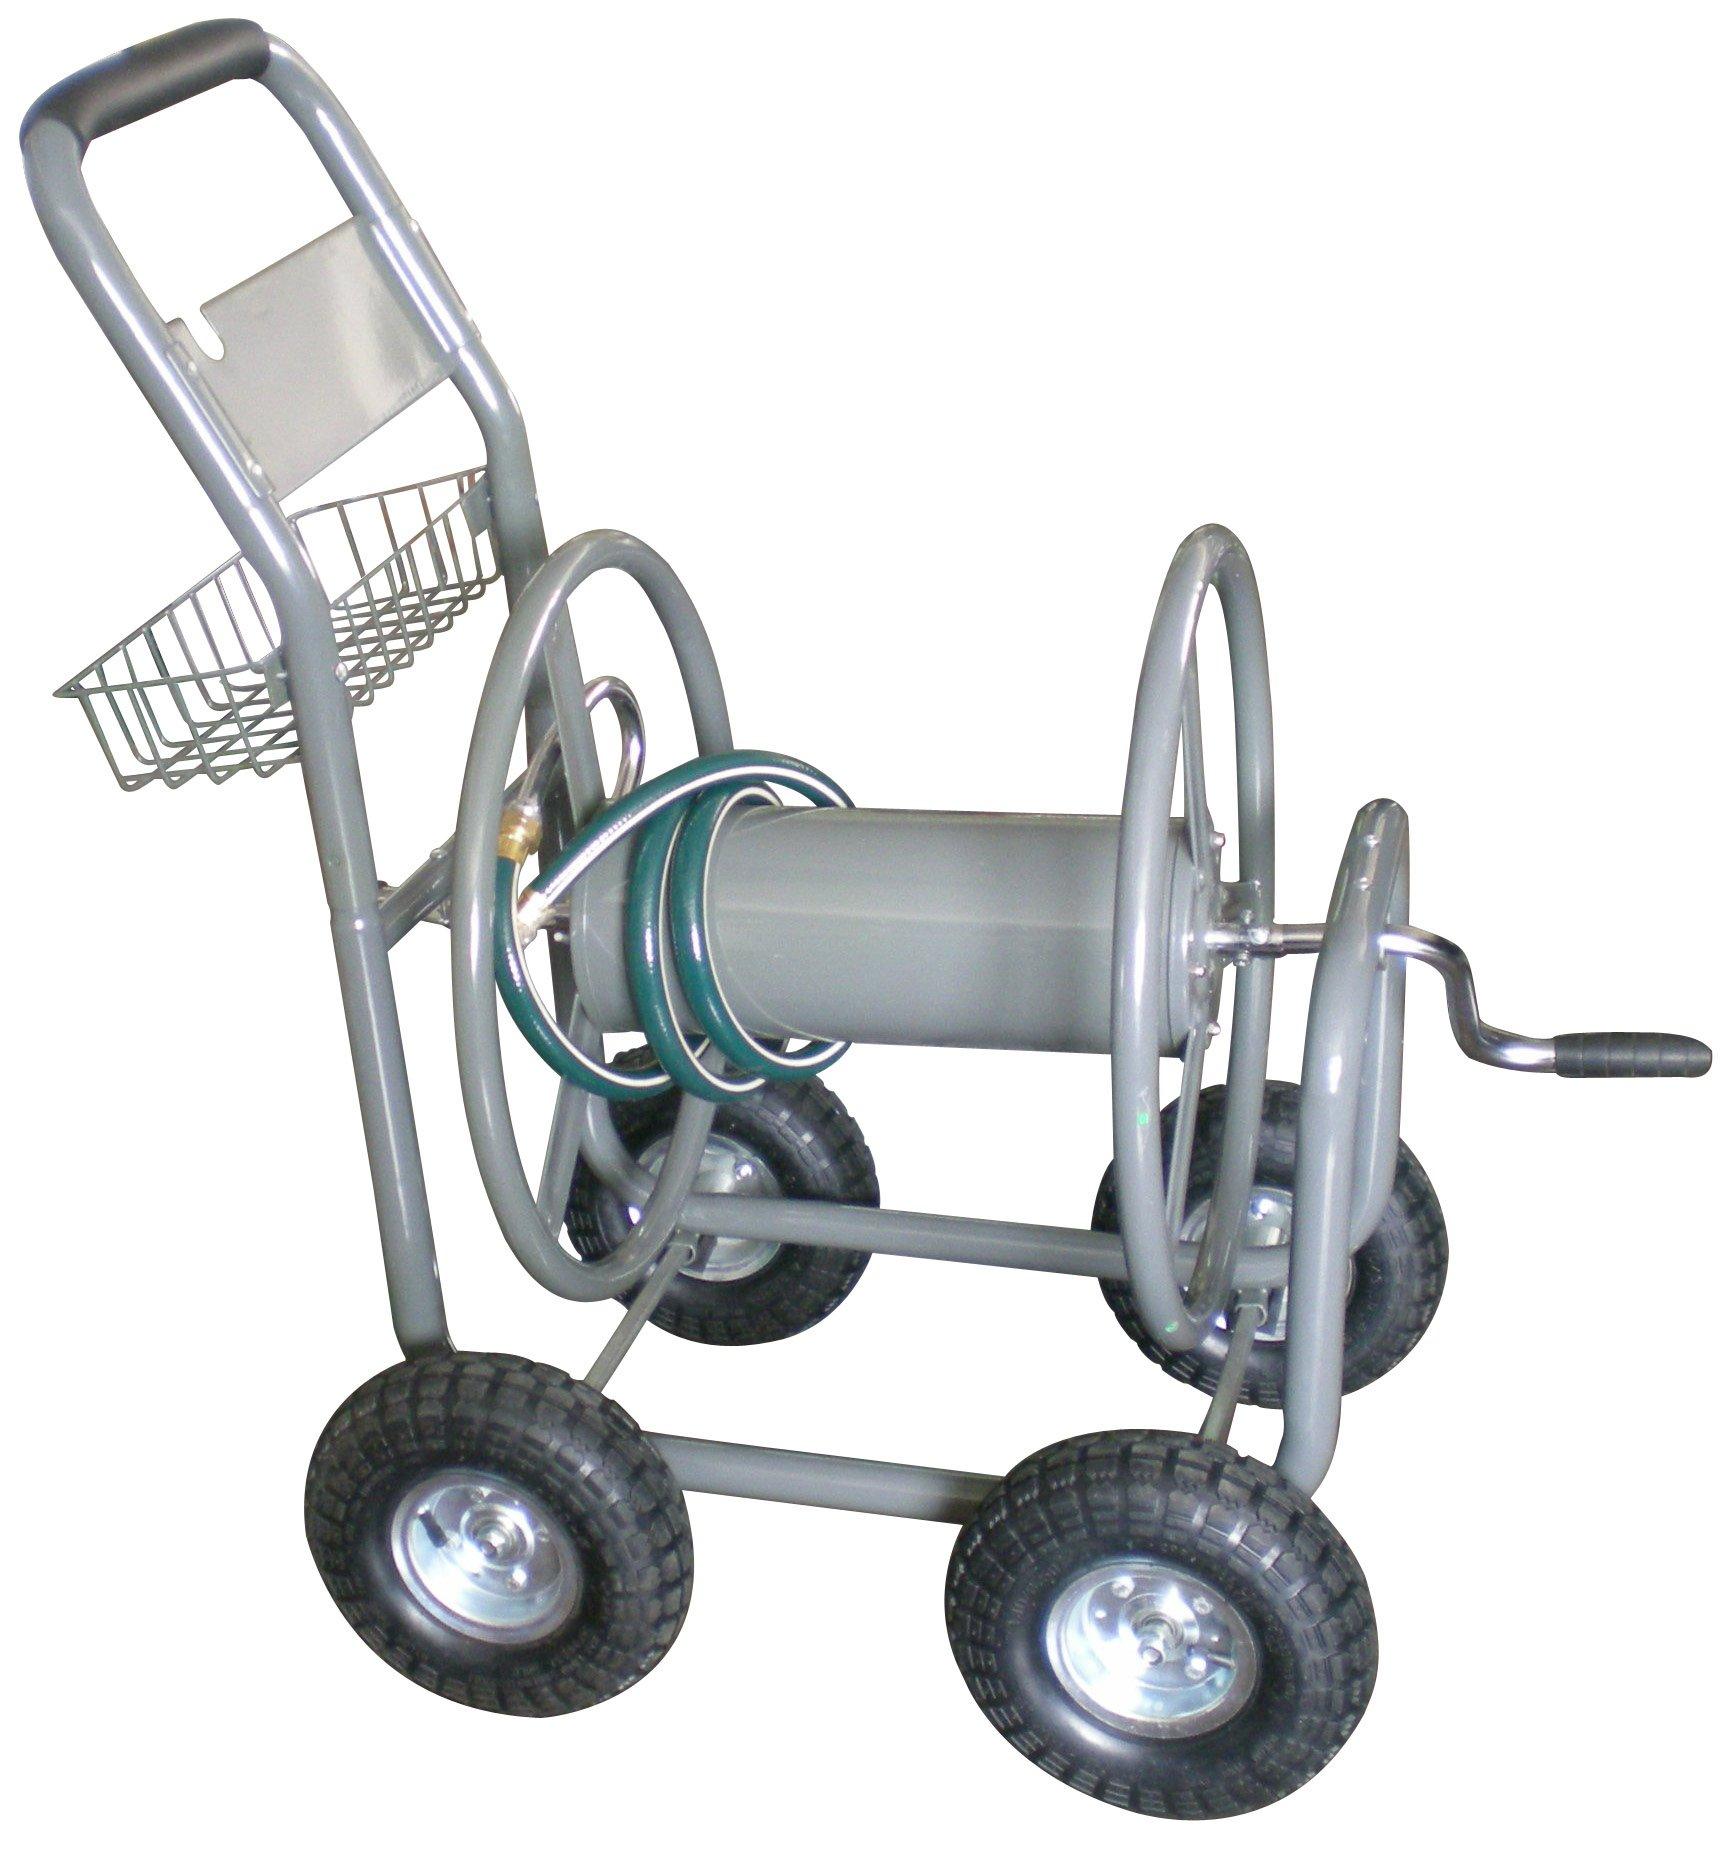 Yard Tuff Hose Reel Cart